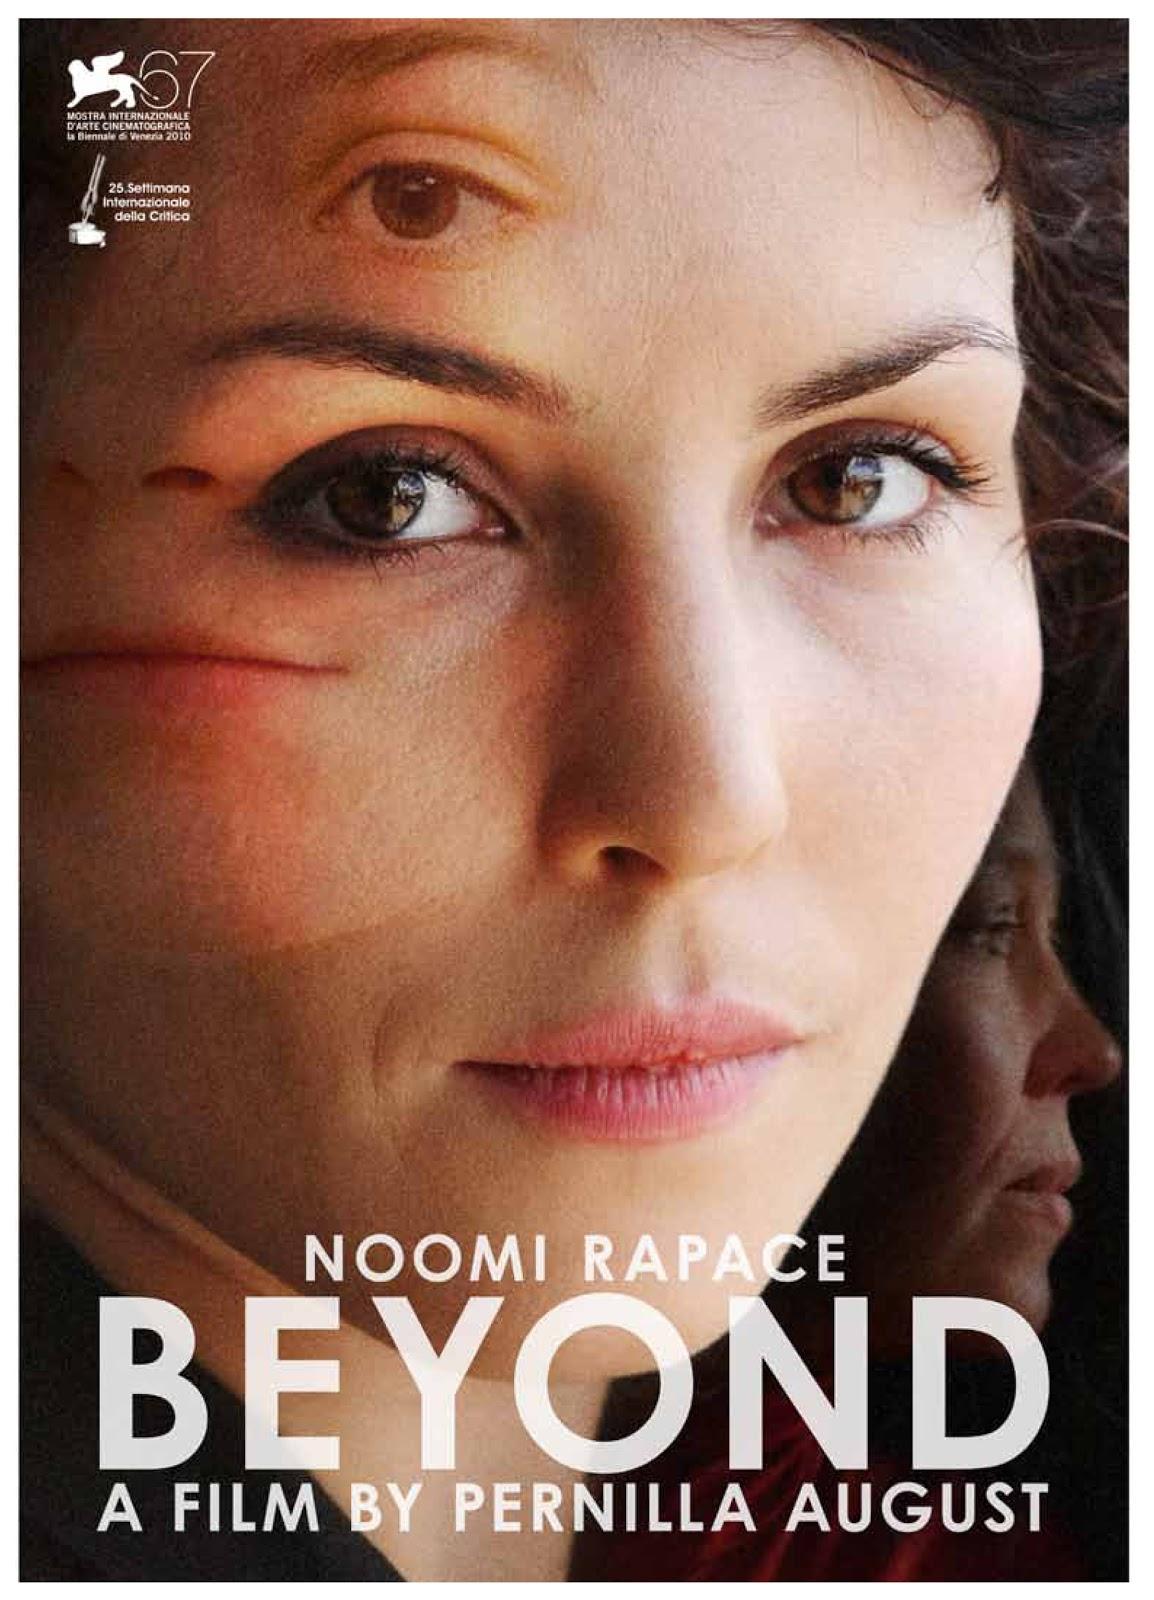 Svinalängorna (Beyond) (2010)